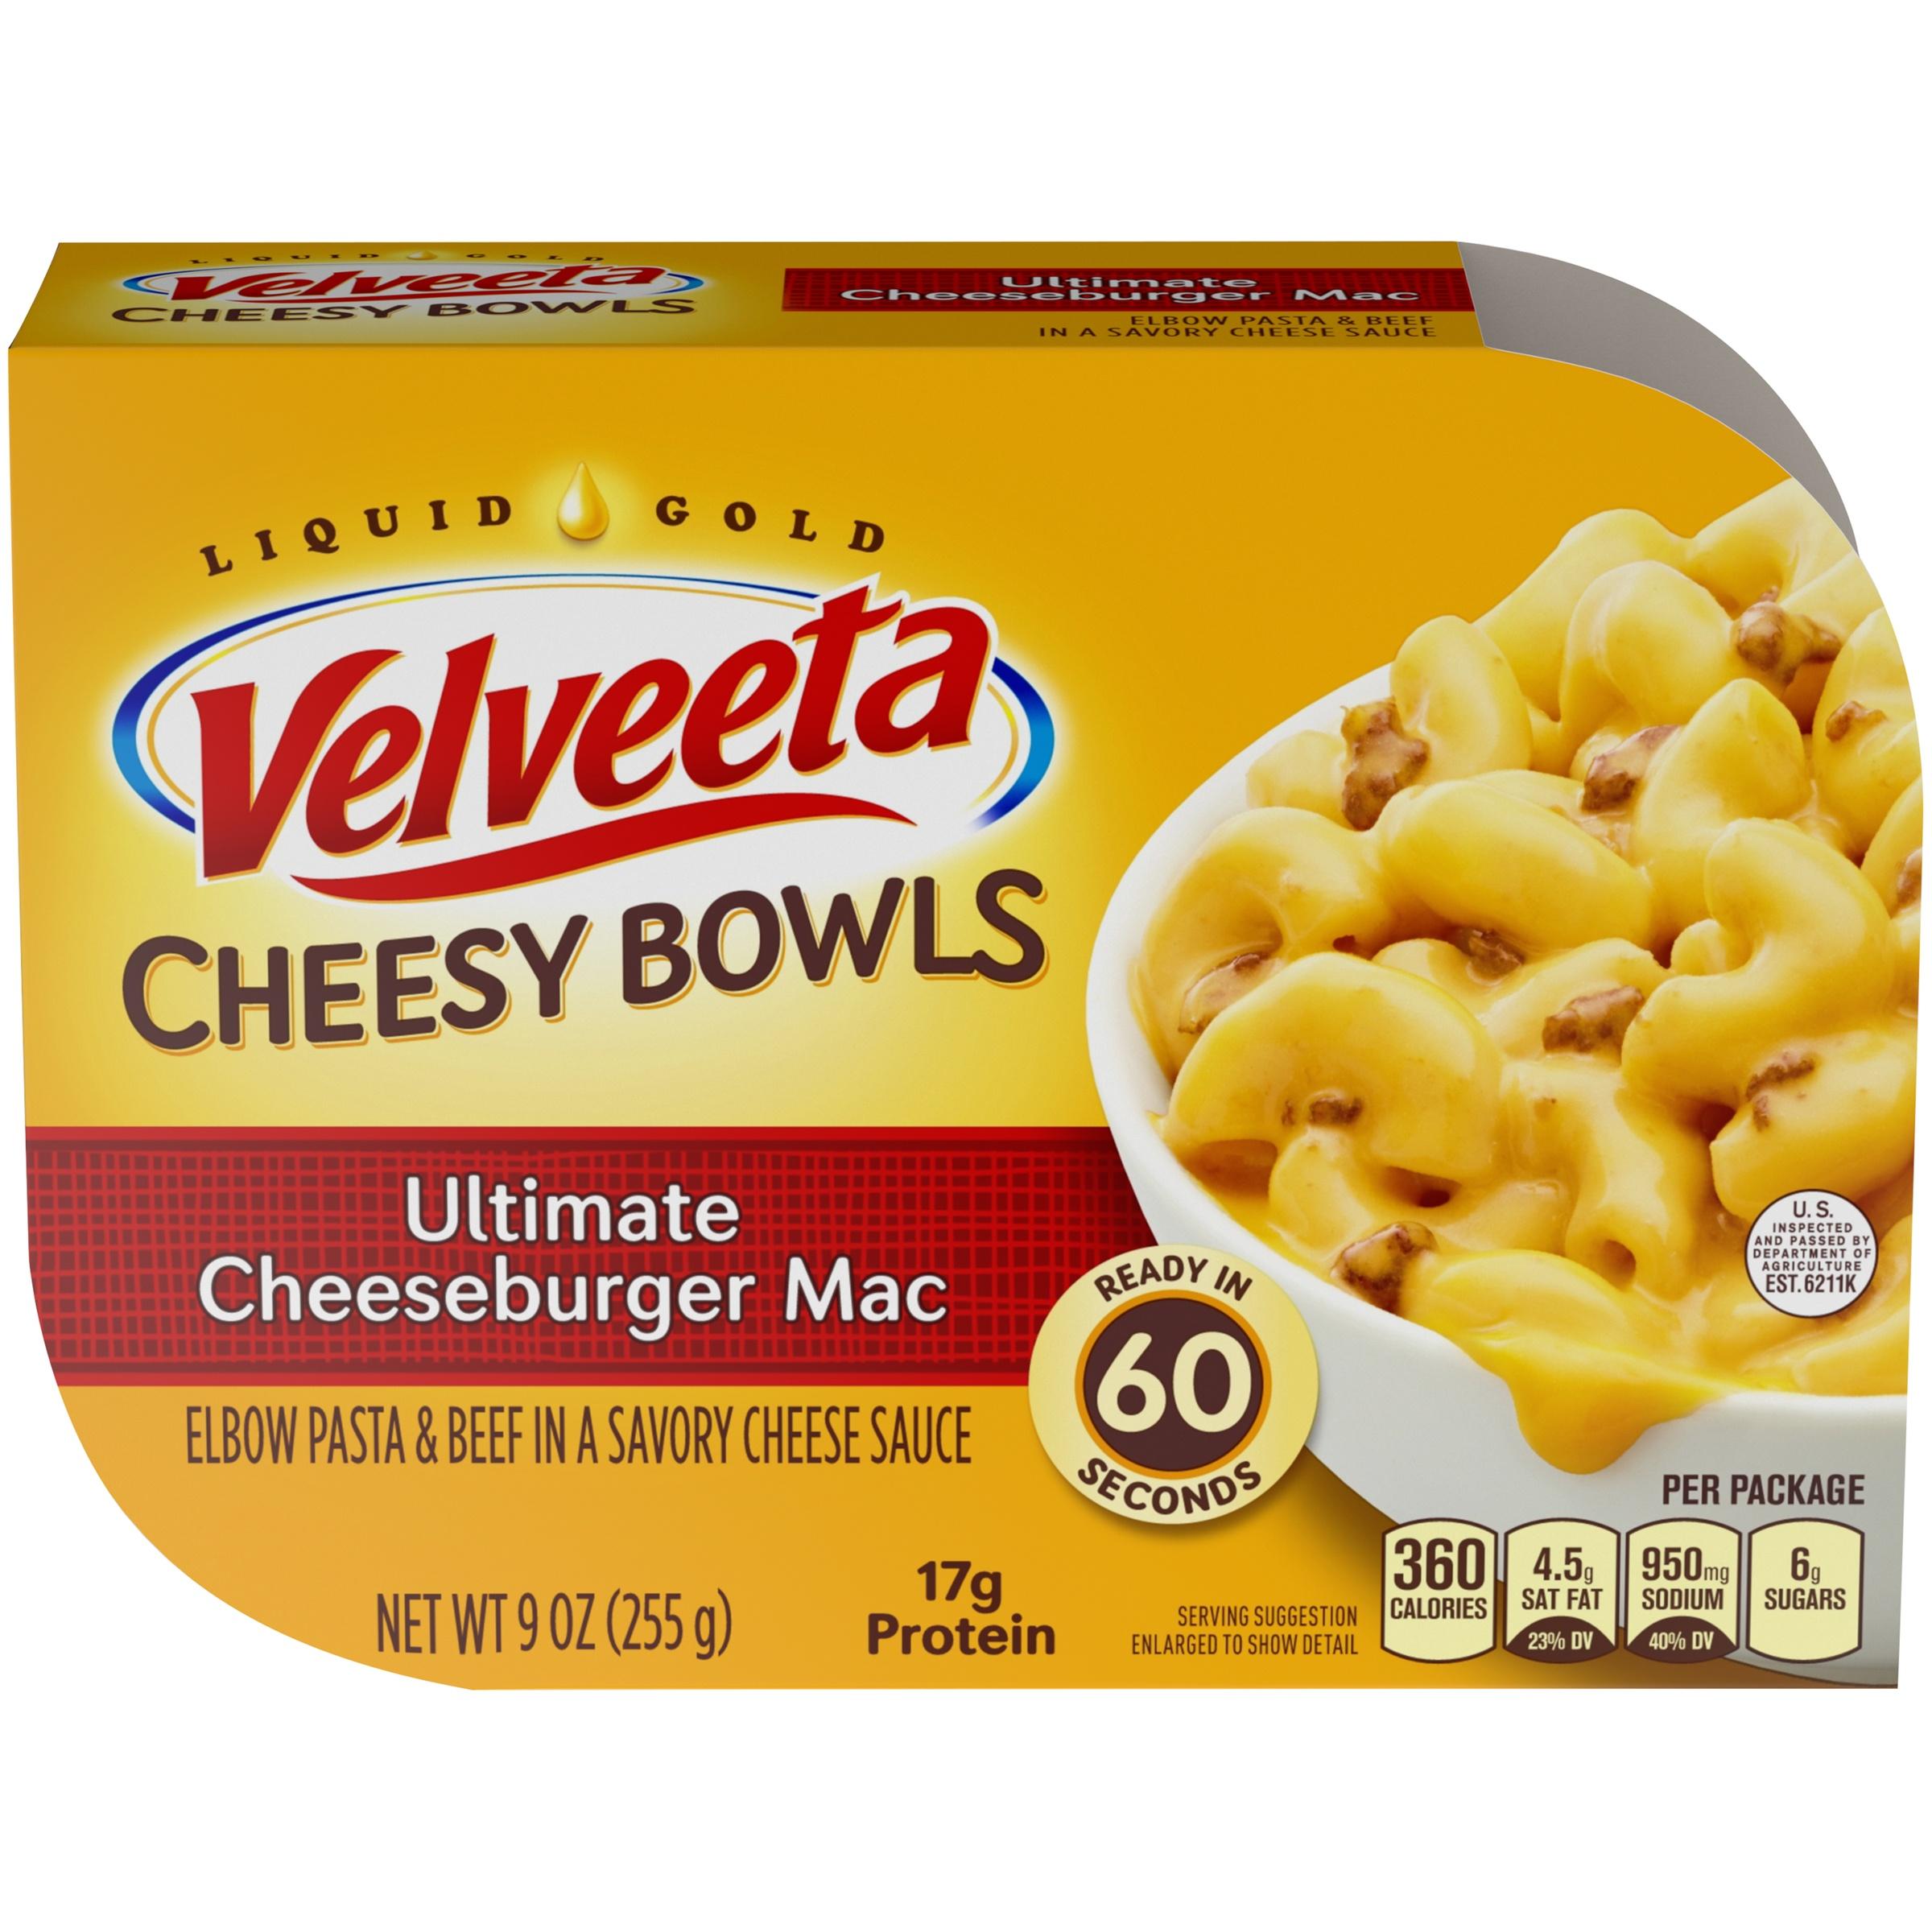 Velveeta Ultimate Cheeseburger Mac Cheesy Bowls 9 oz. Tray